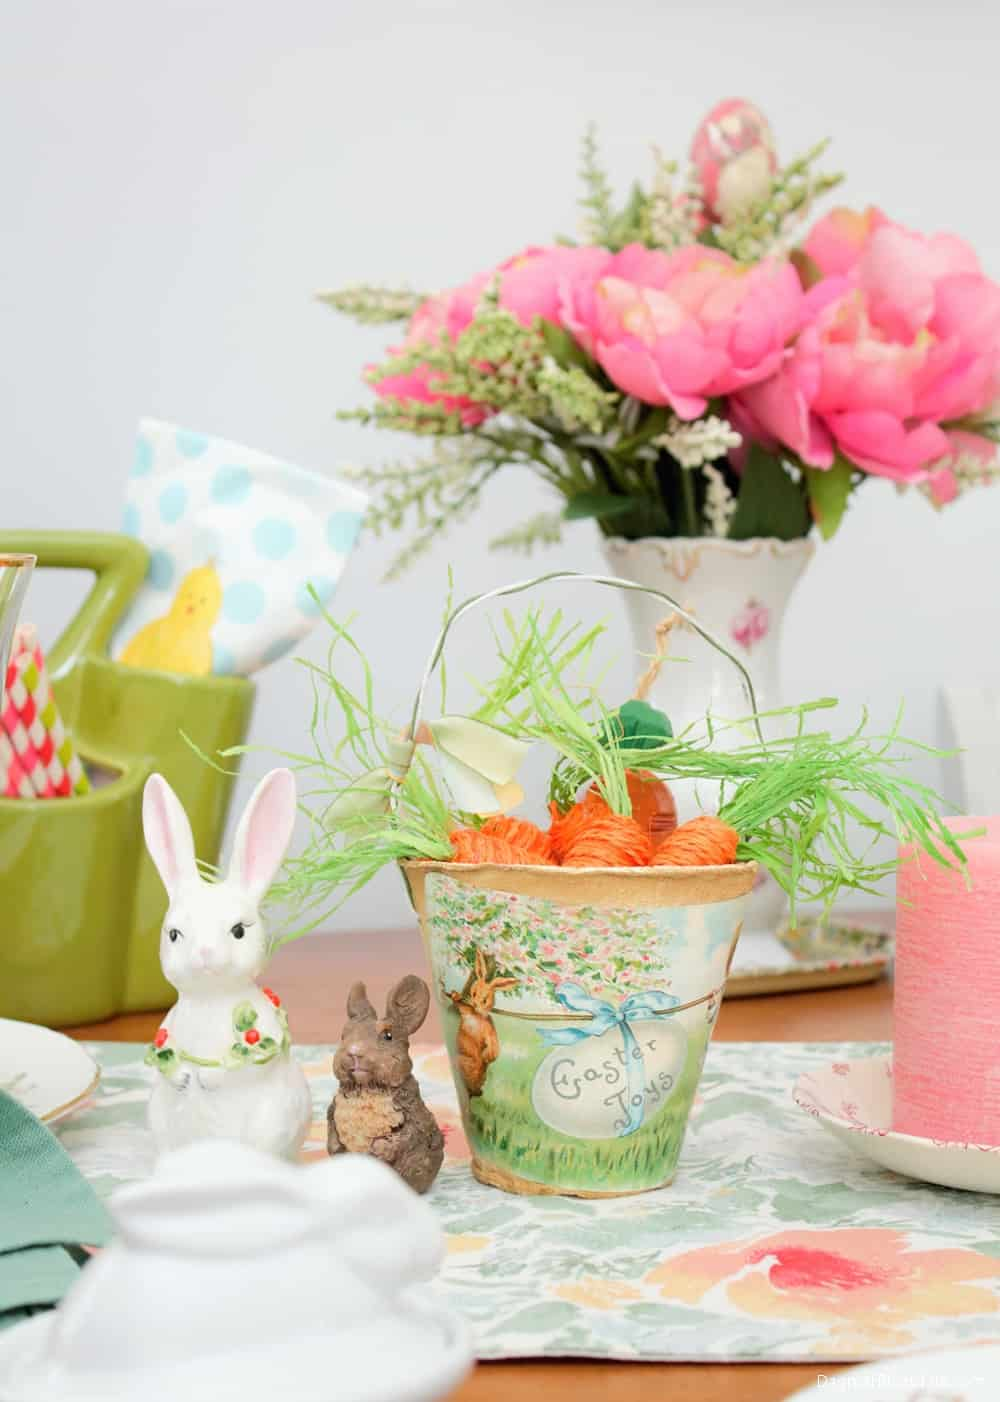 Thrifty Easter decor, DagmarBleasdale.com